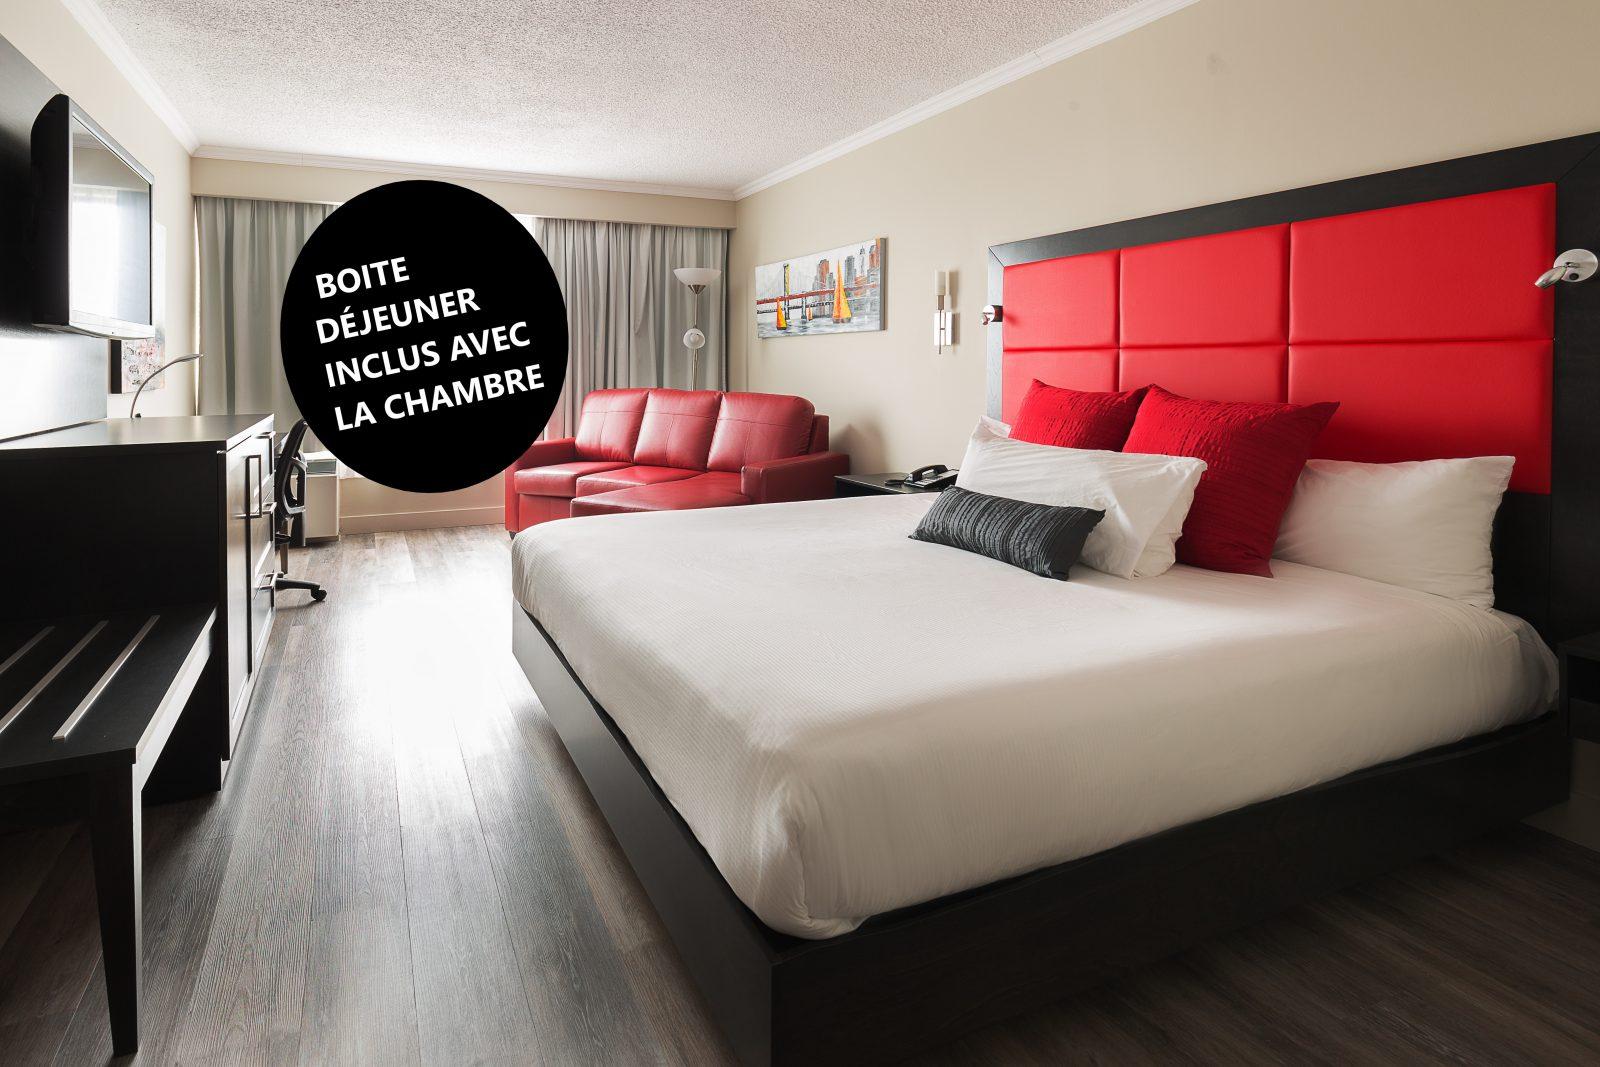 https://www.hoteluniversel.com/wp-content/uploads/2020/05/2Q7A3296-Copie-1600x1067.jpg